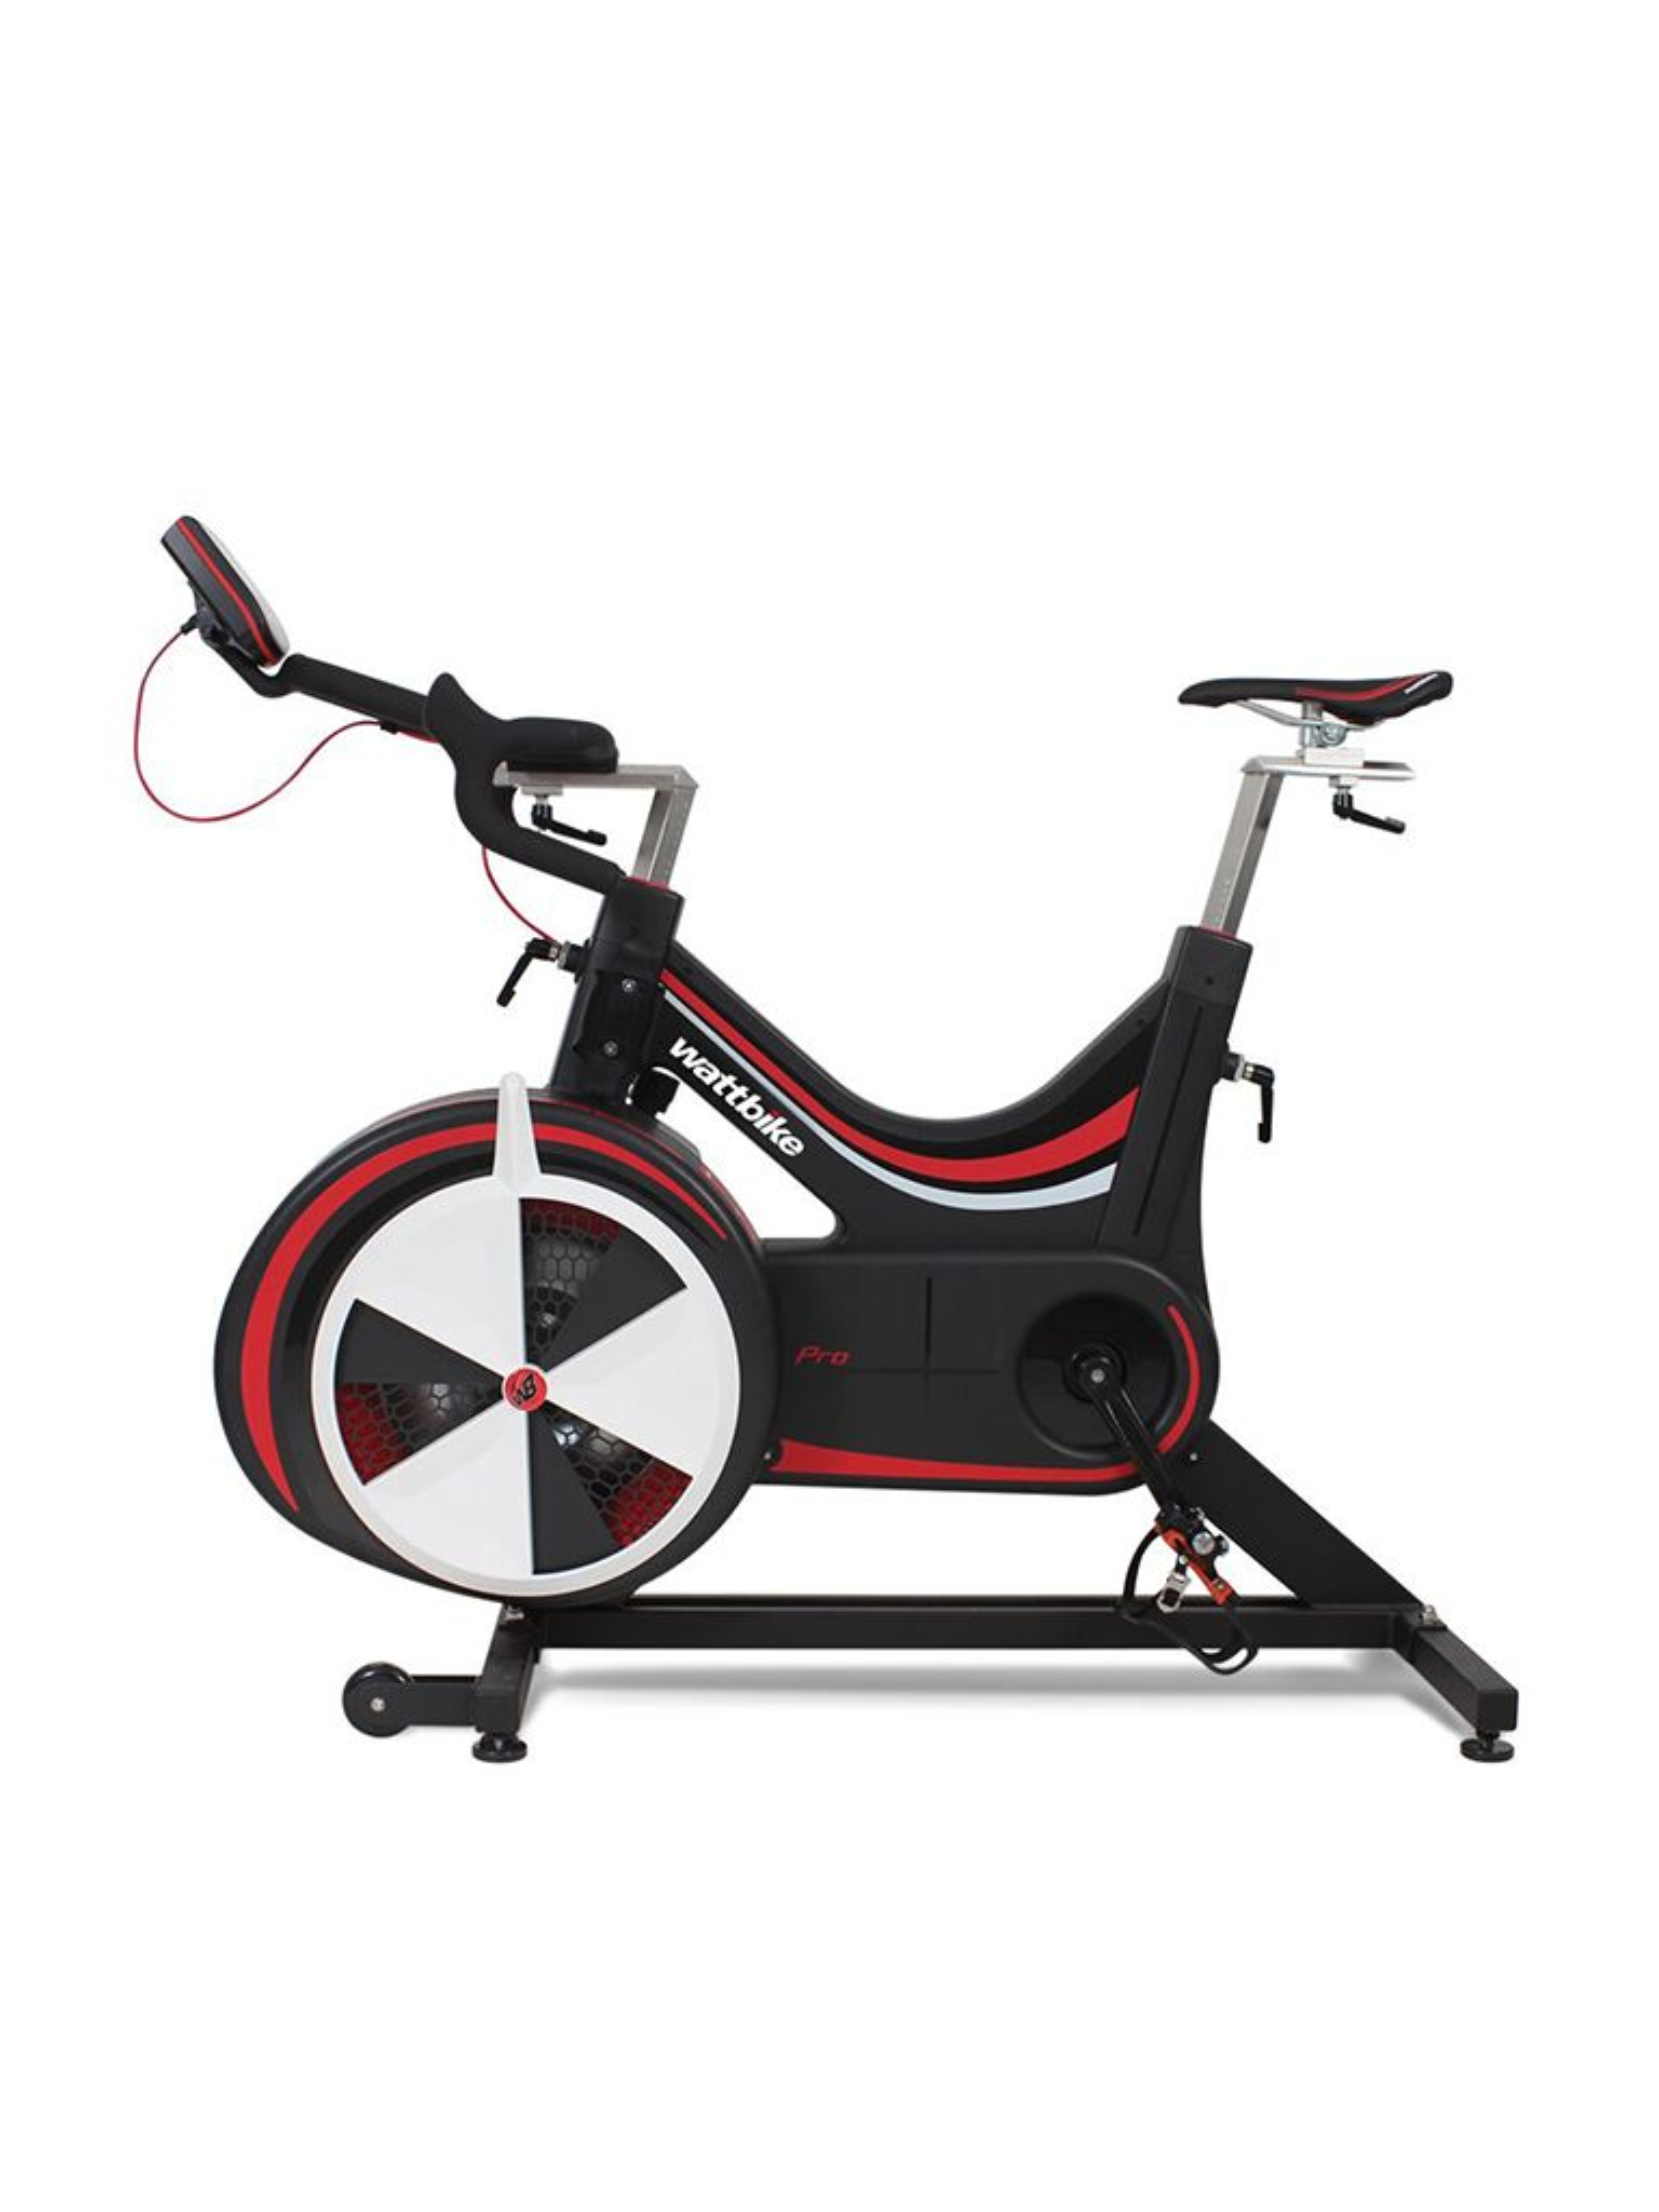 Trainer Bike